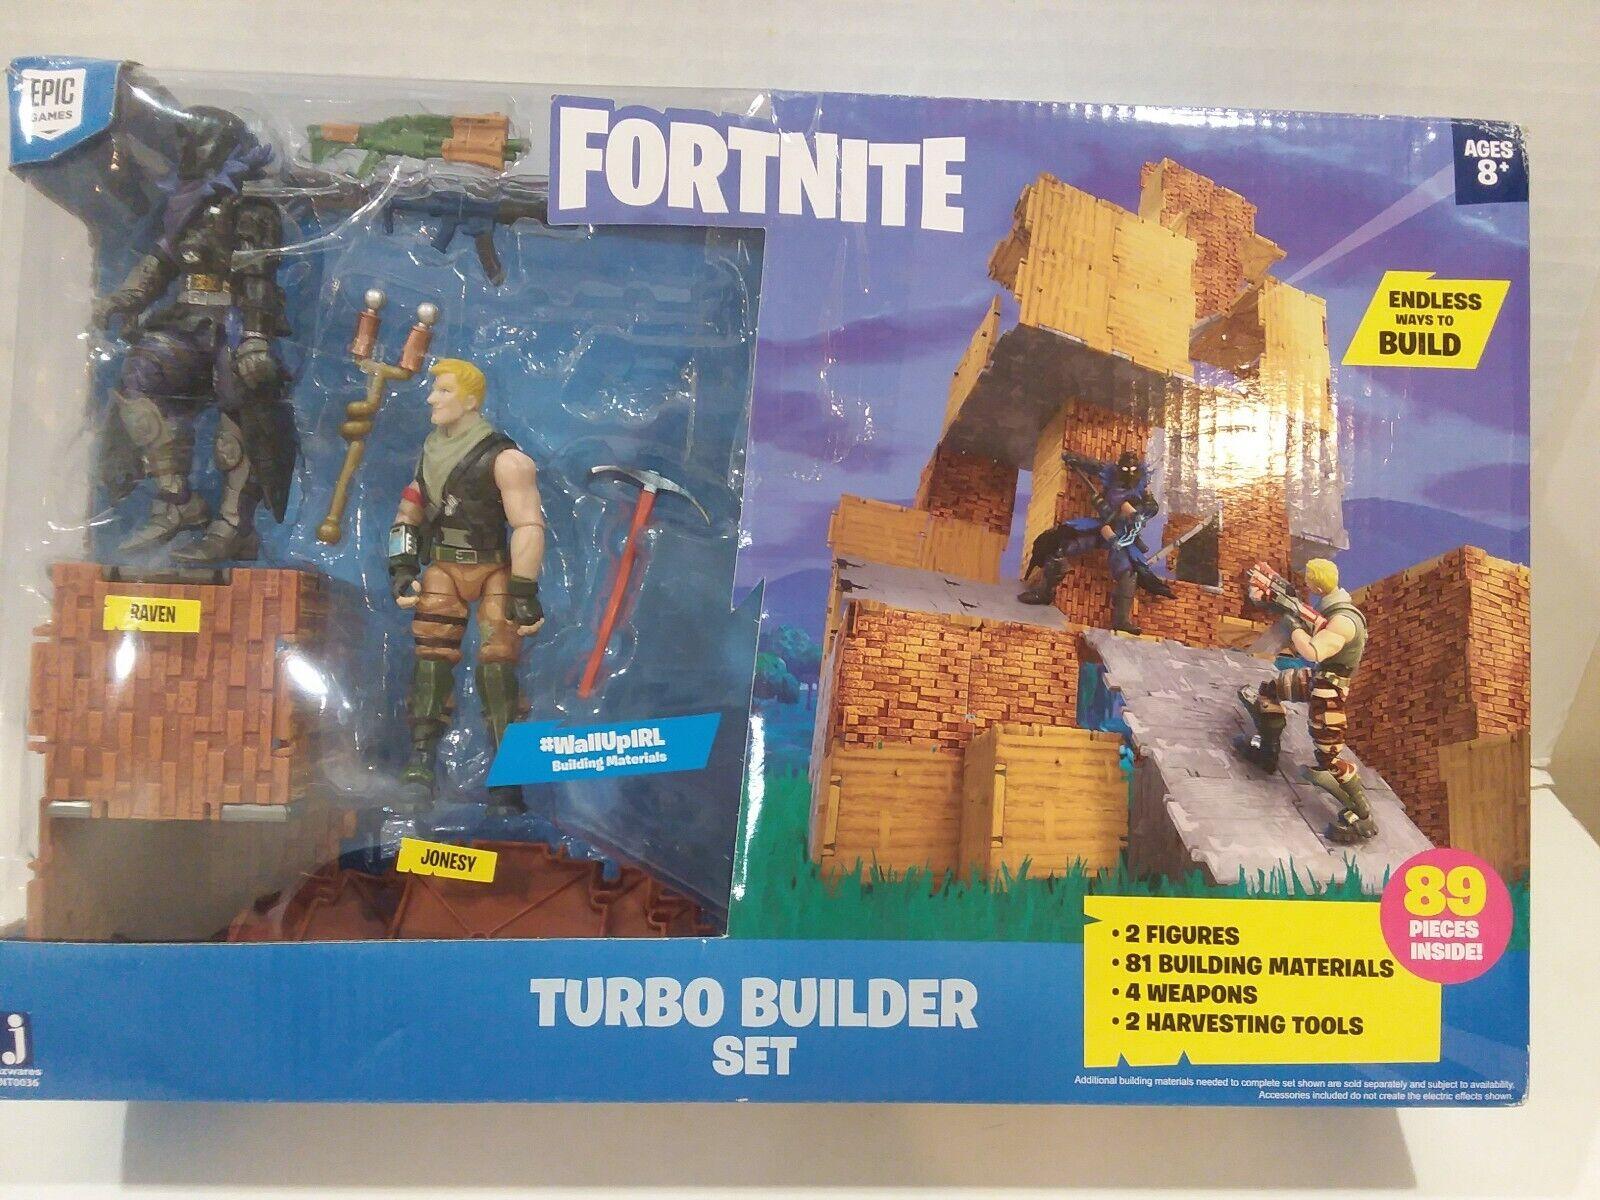 Fortnite Jonesy et Raven Turbo Builder Set 2 Figurines Ensemble 89 pièces